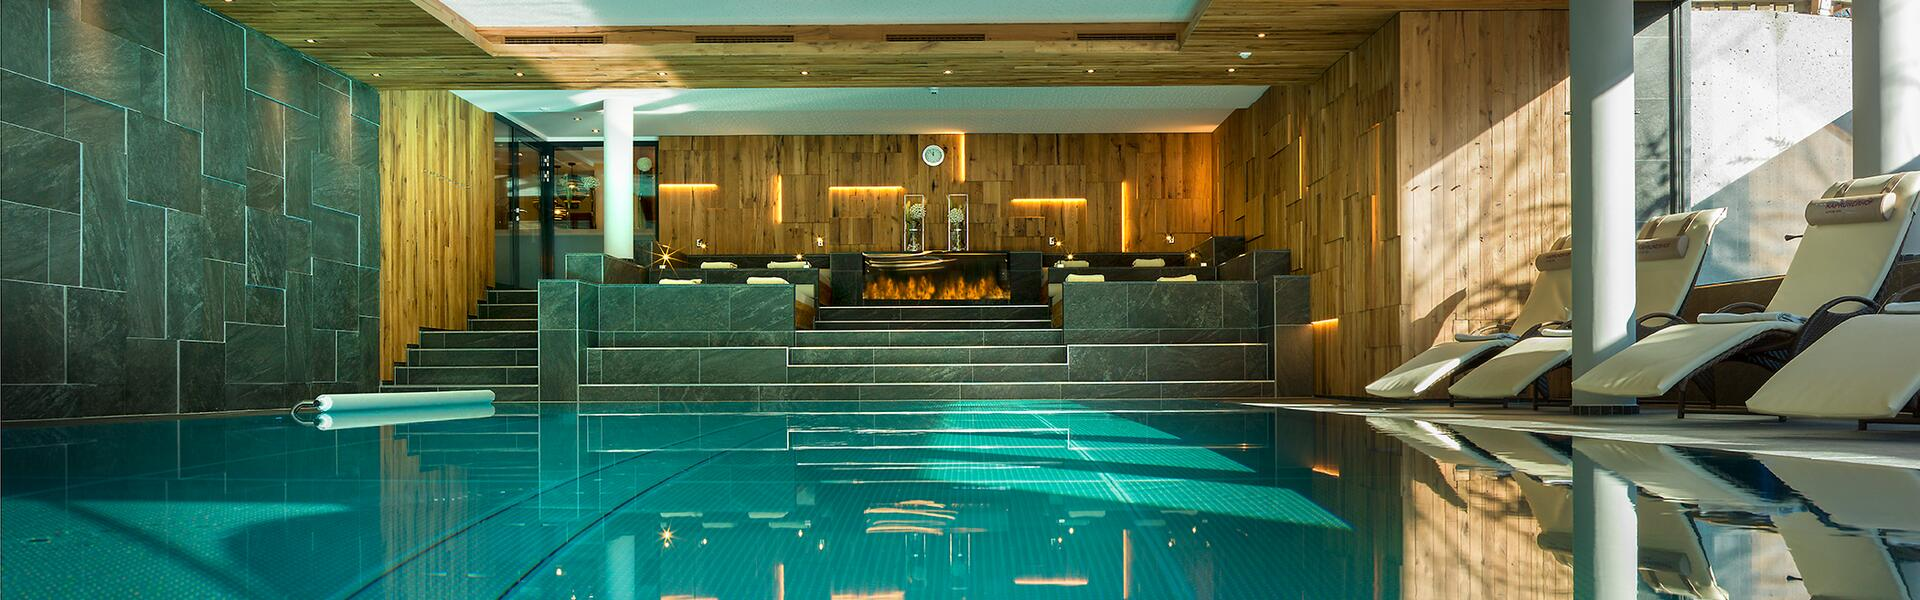 hallenbad hotel kaprunerhof zell am see kaprun hotel kaprunerhof. Black Bedroom Furniture Sets. Home Design Ideas